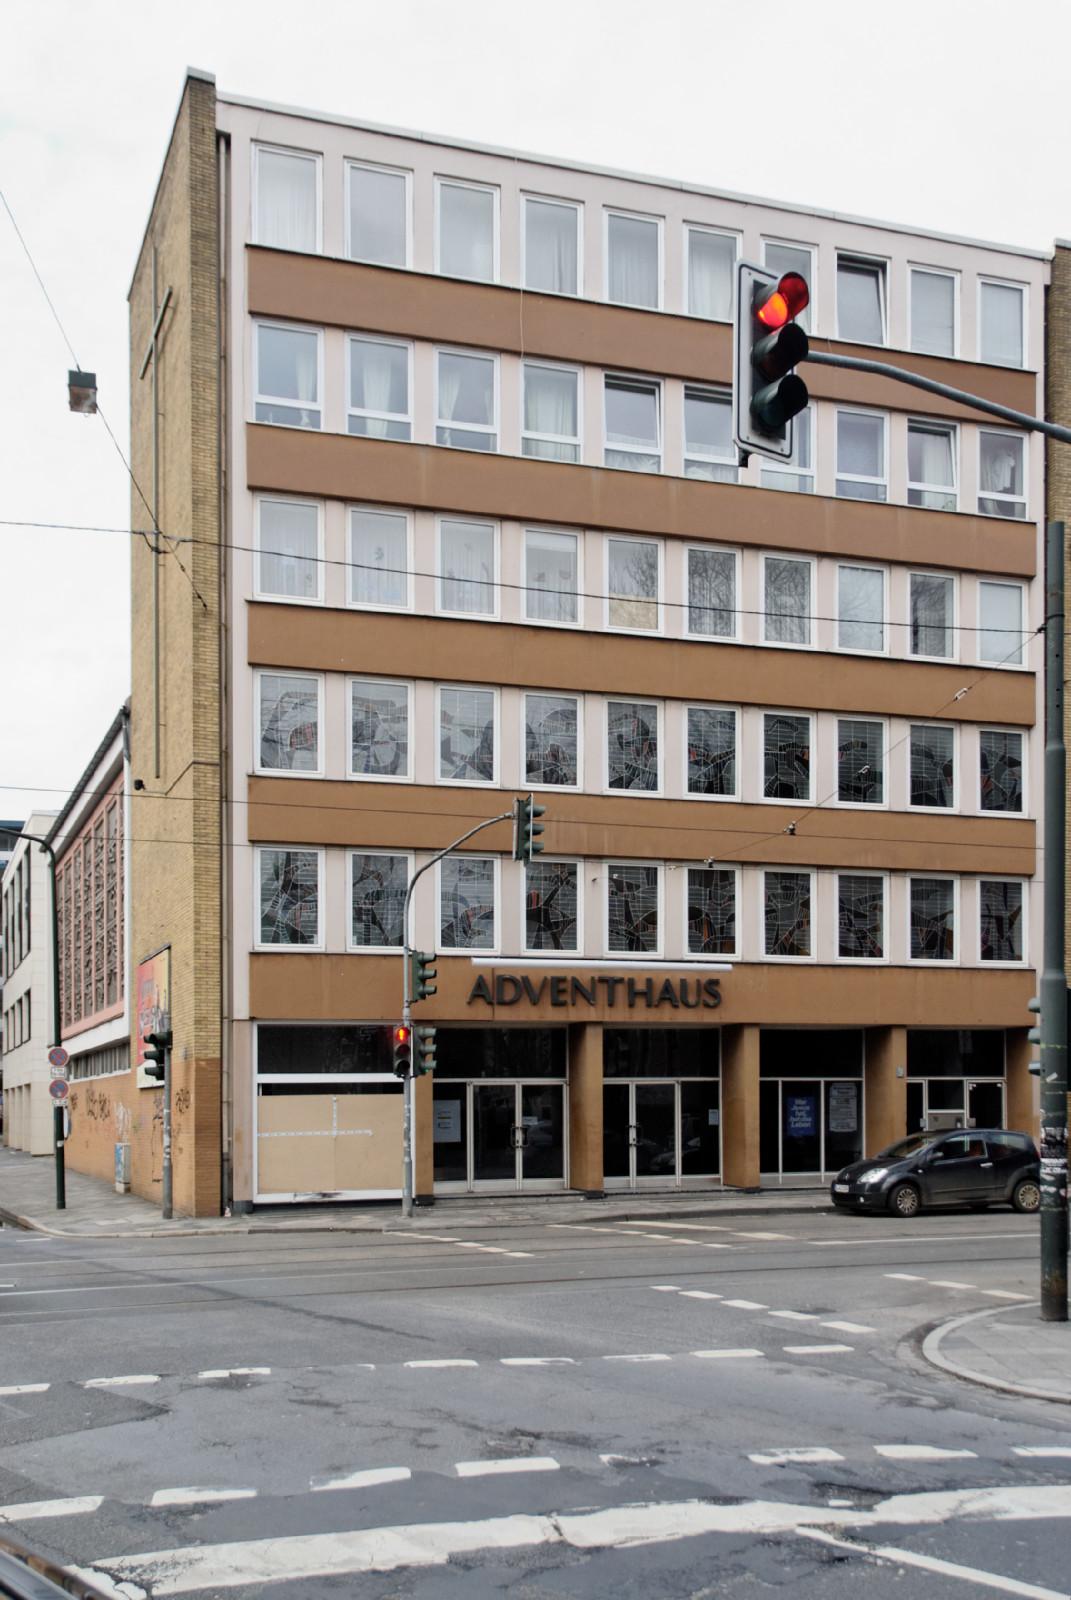 file adventhaus in duesseldorf pempelfort von wikimedia commons. Black Bedroom Furniture Sets. Home Design Ideas